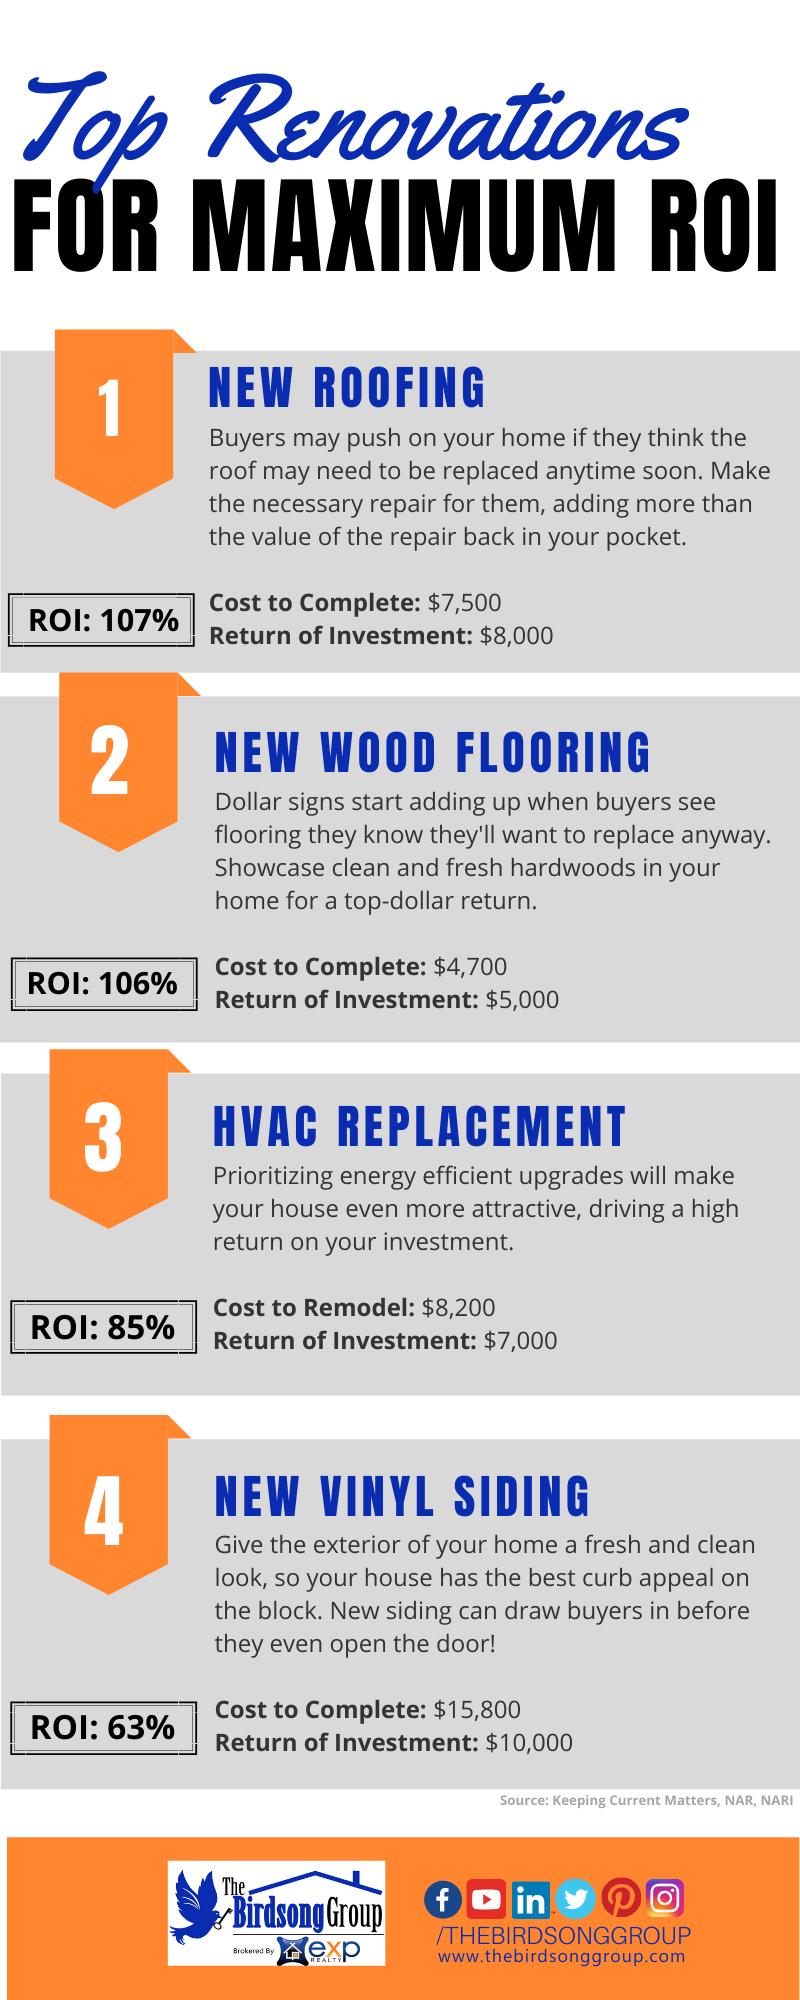 Top Renovations for maximum roi blog.png